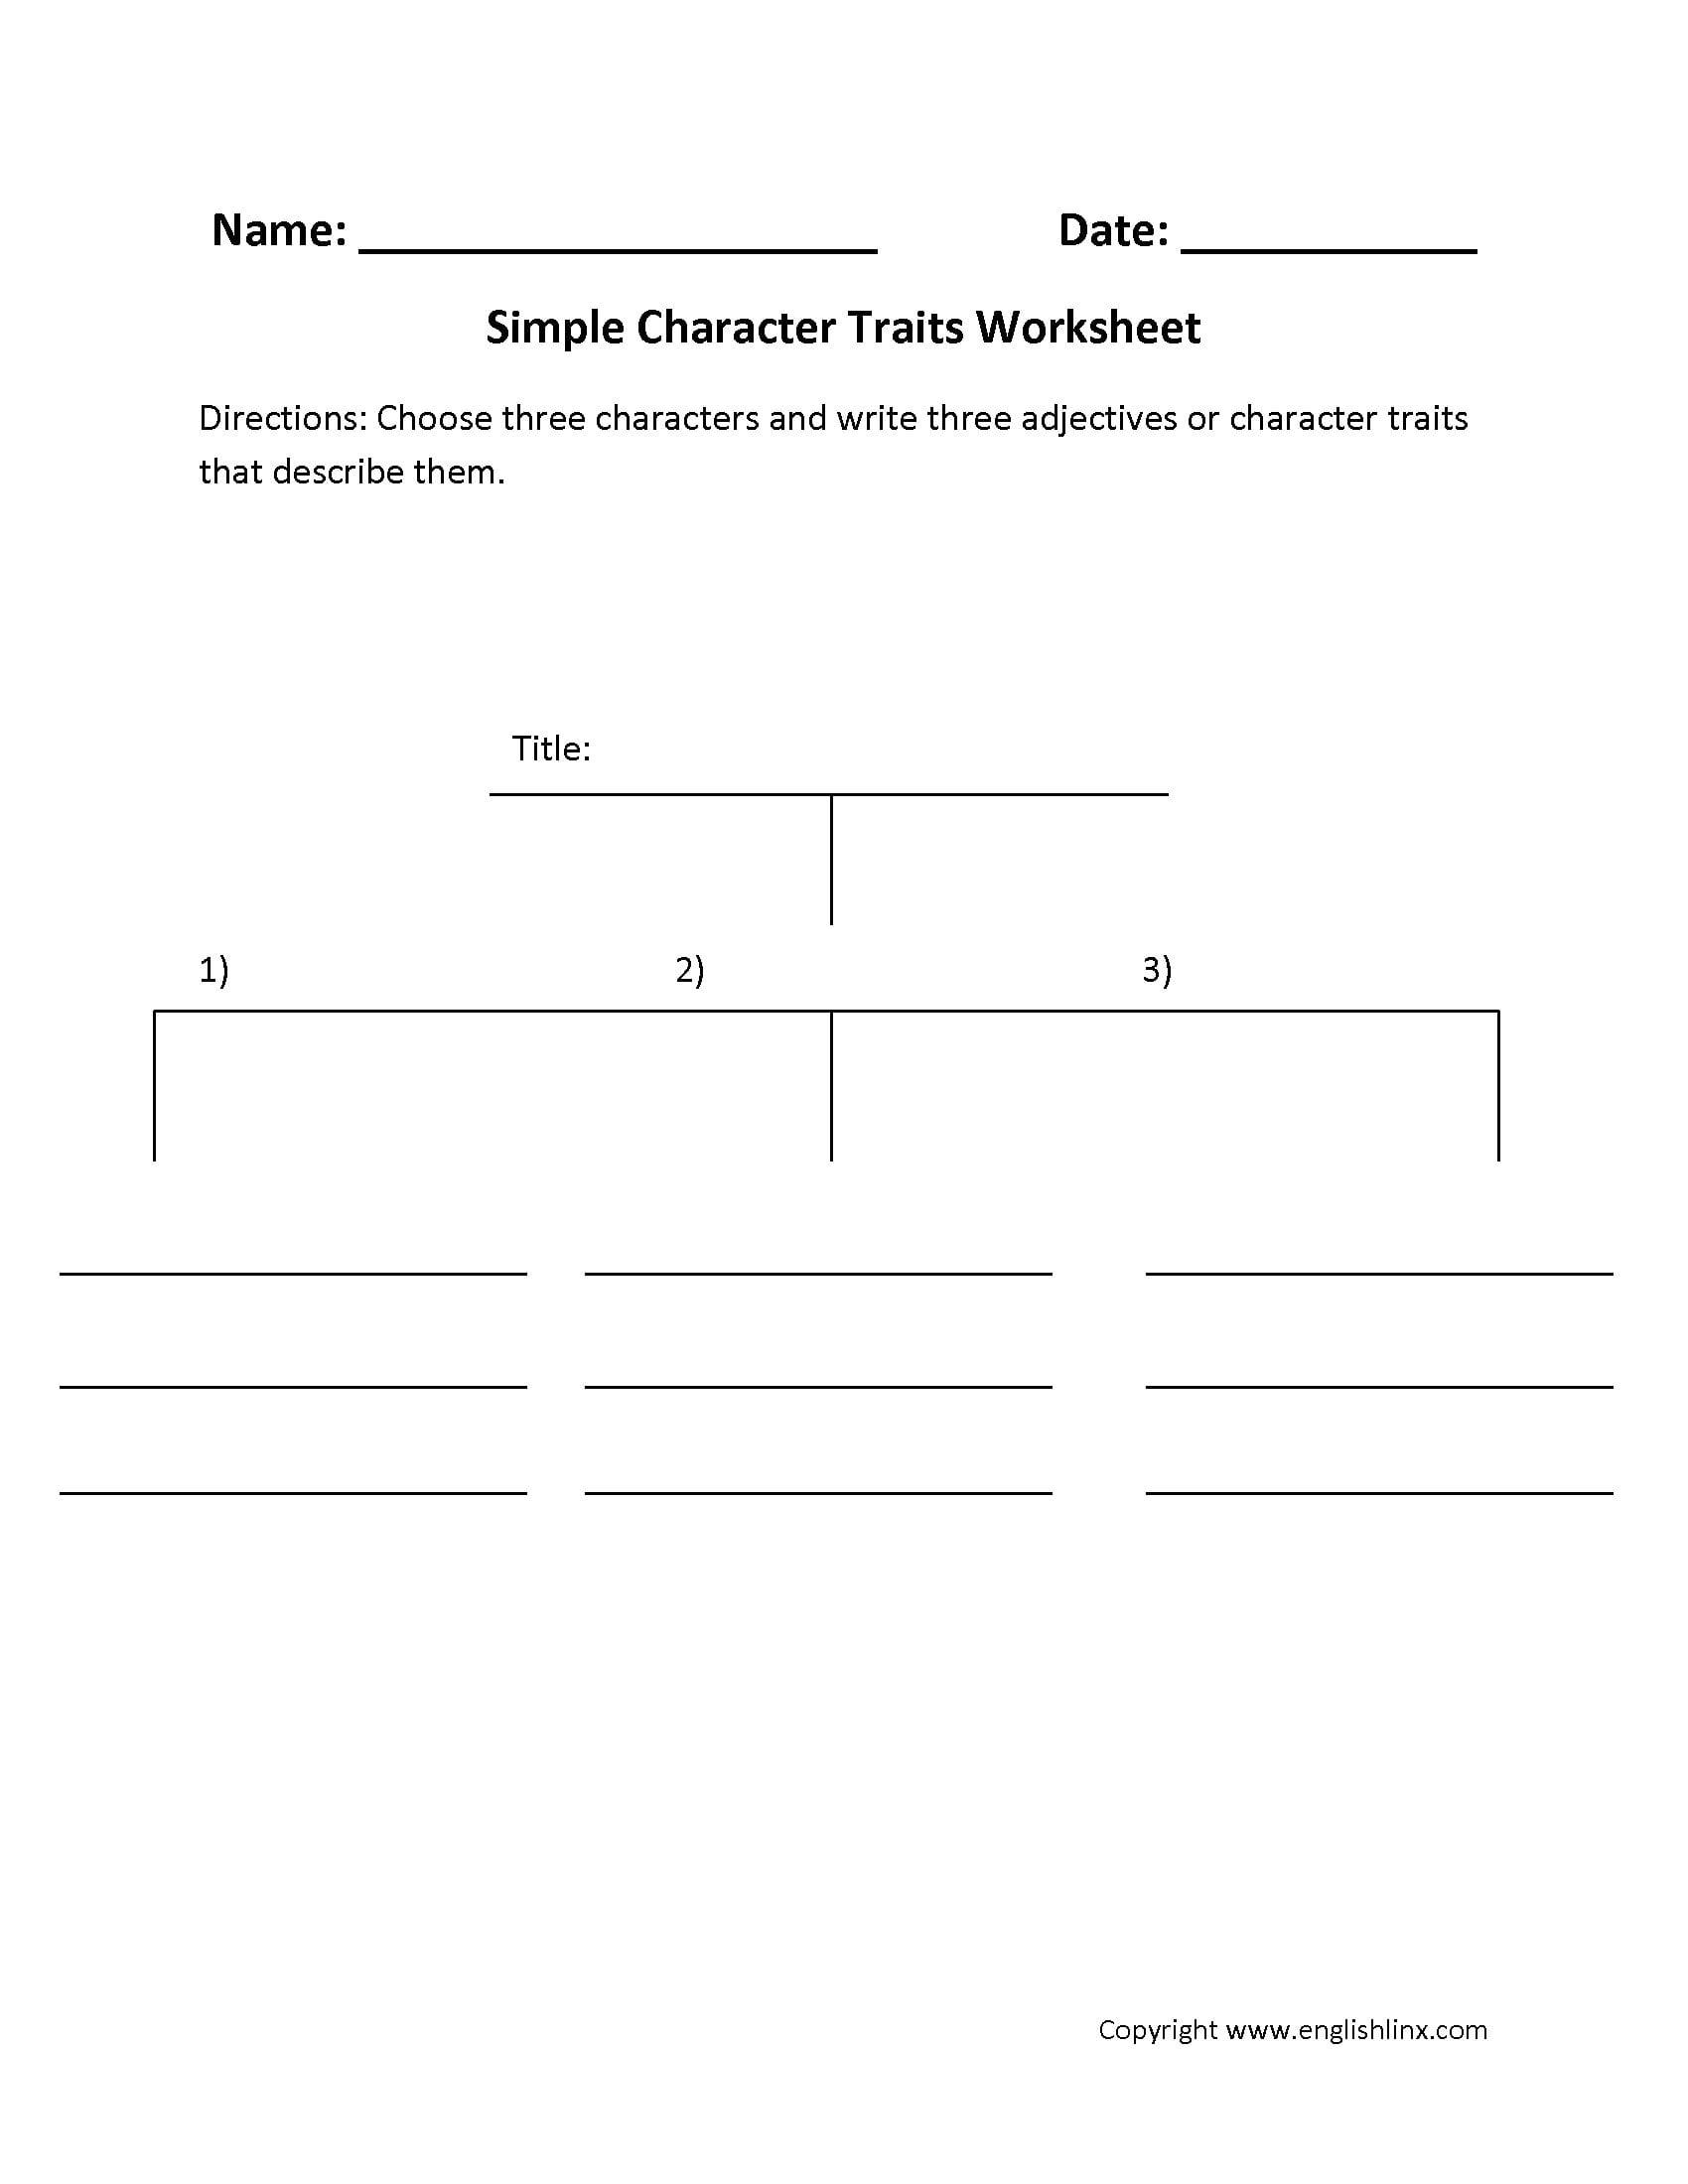 Englishlinx Characterysis Worksheets